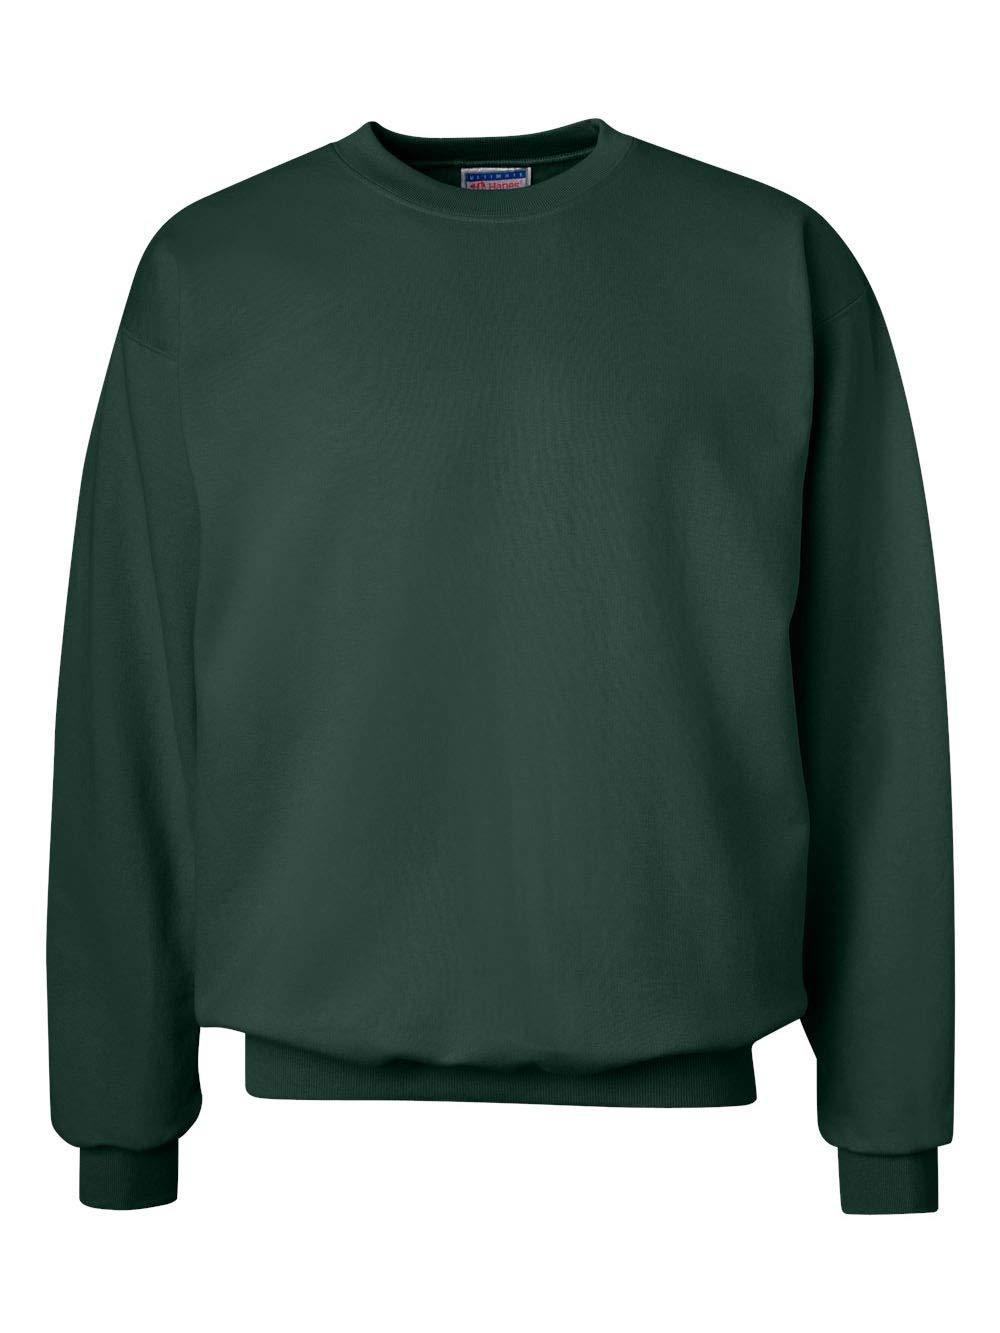 Hanes Men's Ultimate Heavyweight Fleece Sweatshirt, Deep Forest, 3X-Large